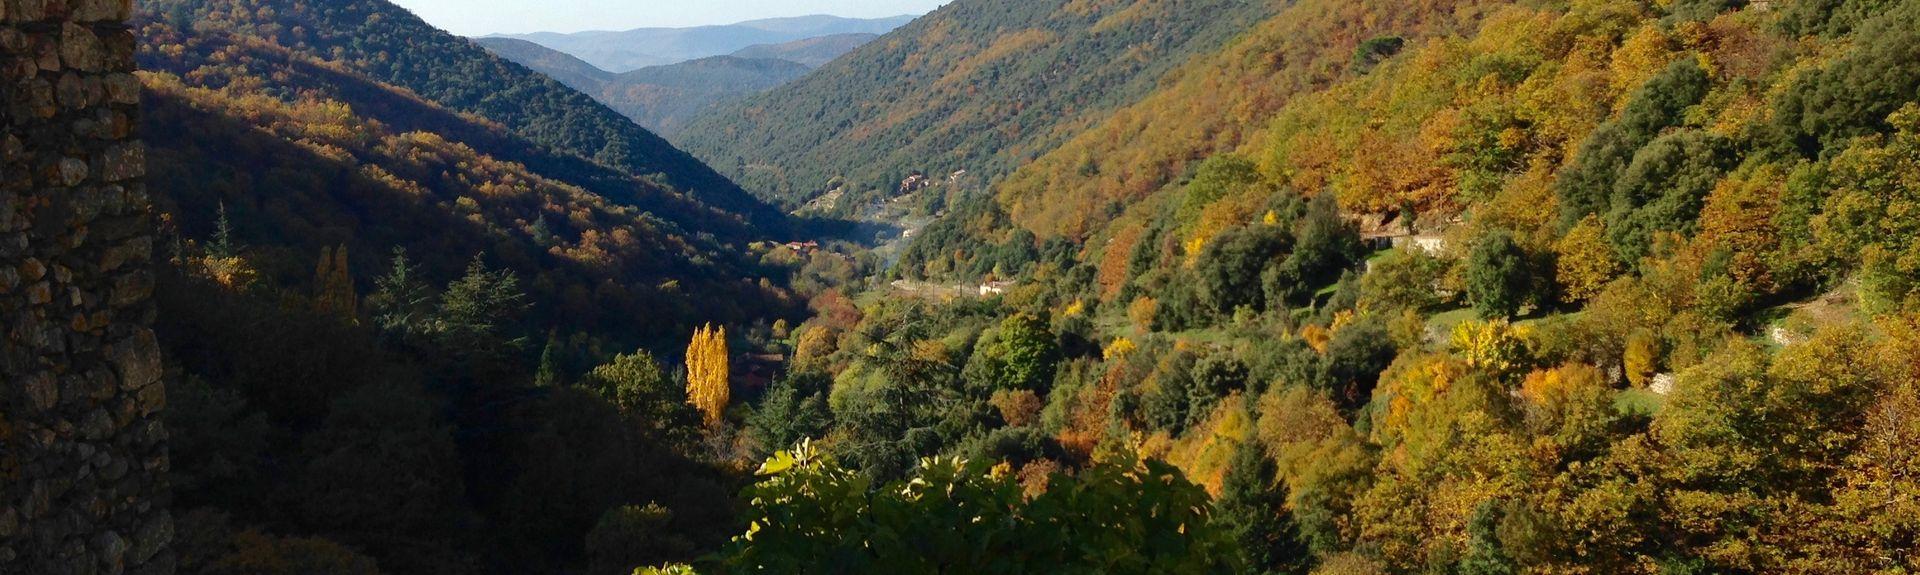 Mont Aigoual (Όρος), Bassurels, Οξιτανί, Γαλλία